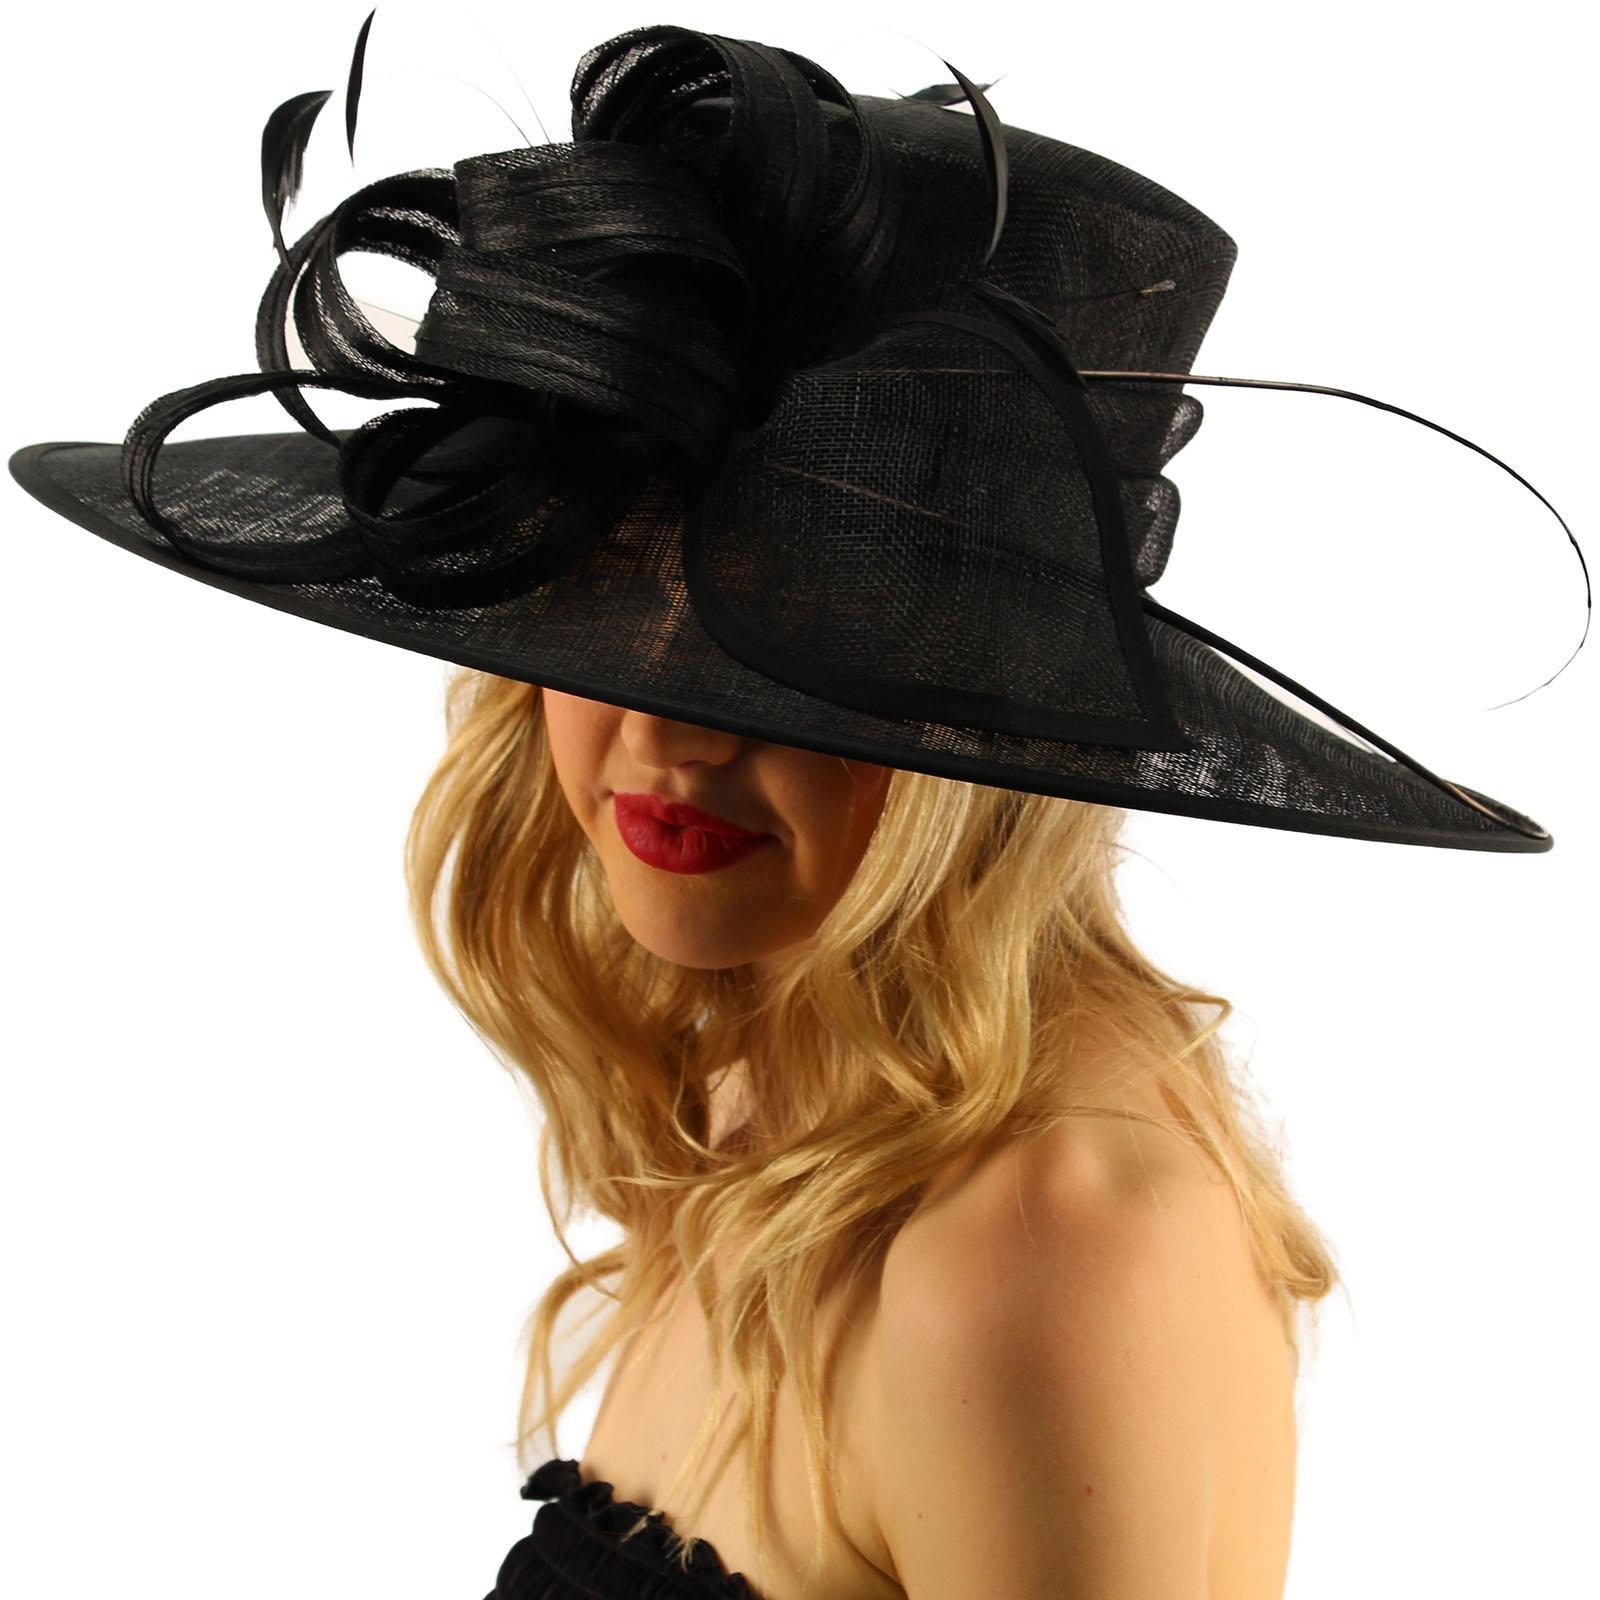 SK Hat shop British Regal Sinamy Ribbon Feathers Quill Derby Floppy Bucket Dressy Hat Black